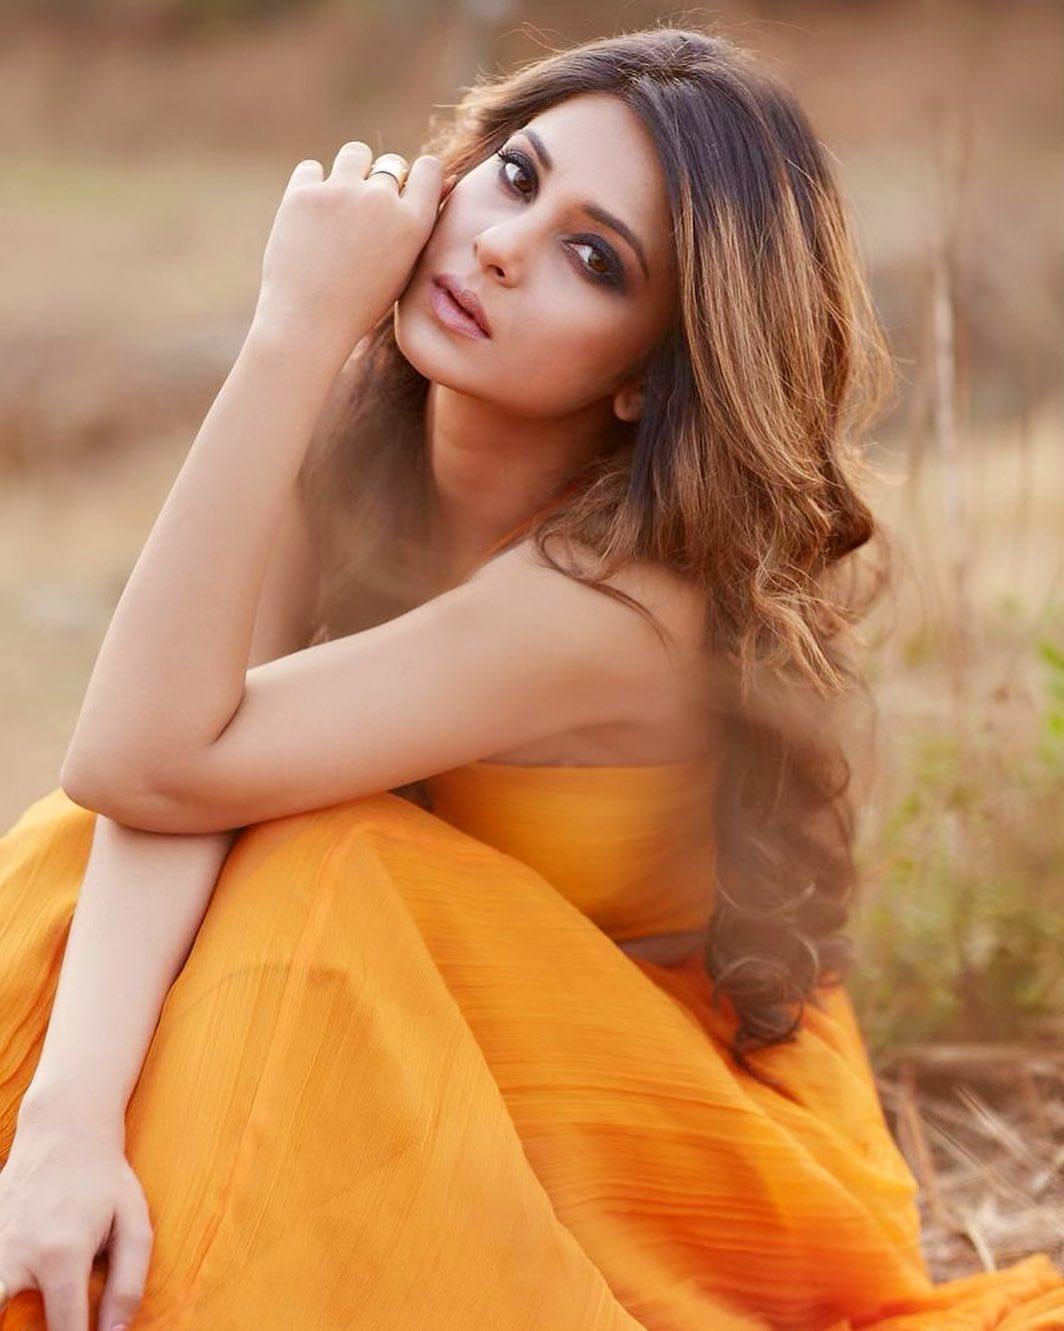 Bollywood Tadka, जेनिफर विंगेट इमेज, जेनिफर विंगेट फोटो, जेनिफर विंगेट पिक्चर